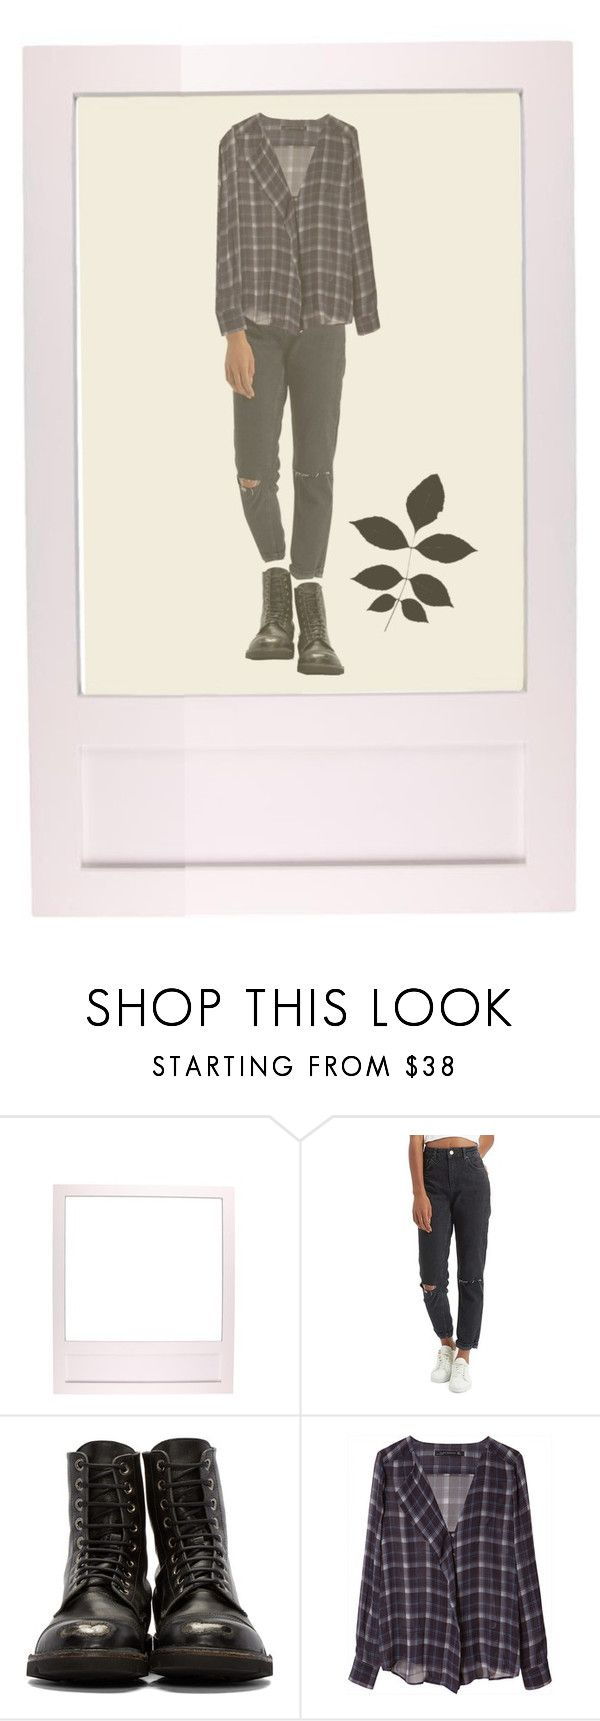 Pose so Tumblr by fancyinternetangel on Polyvore featuring moda, Zara and Topshop